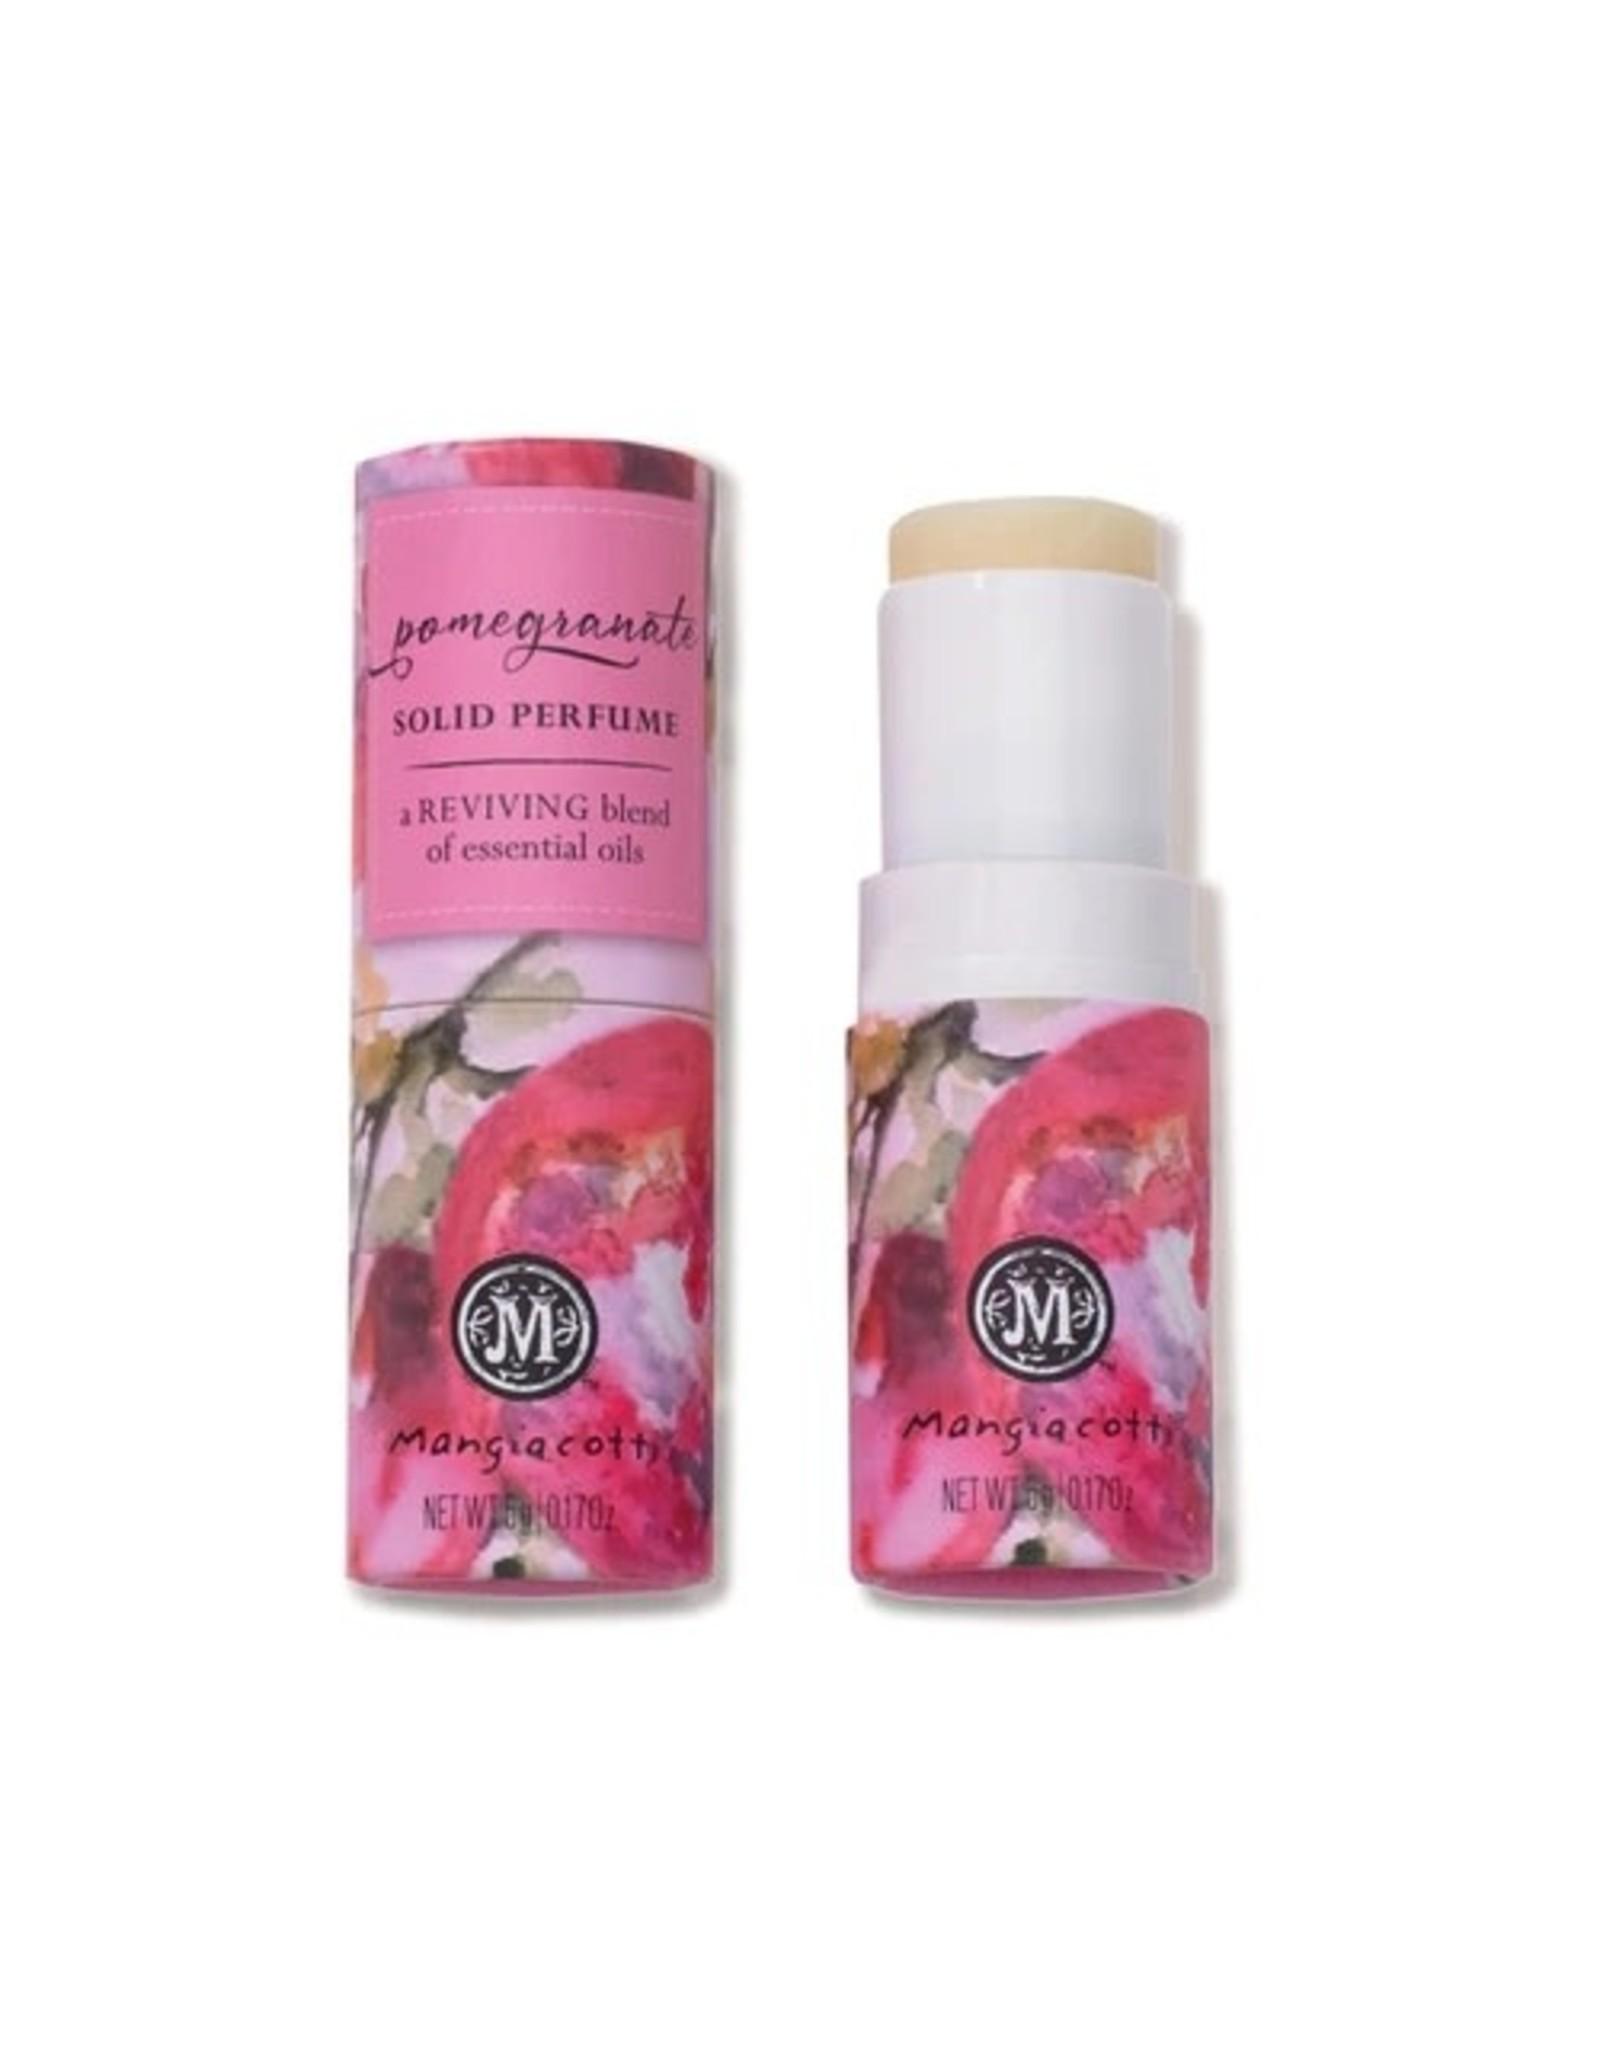 Mangicotti Mangiacotti Solid Perfume Pomegranate